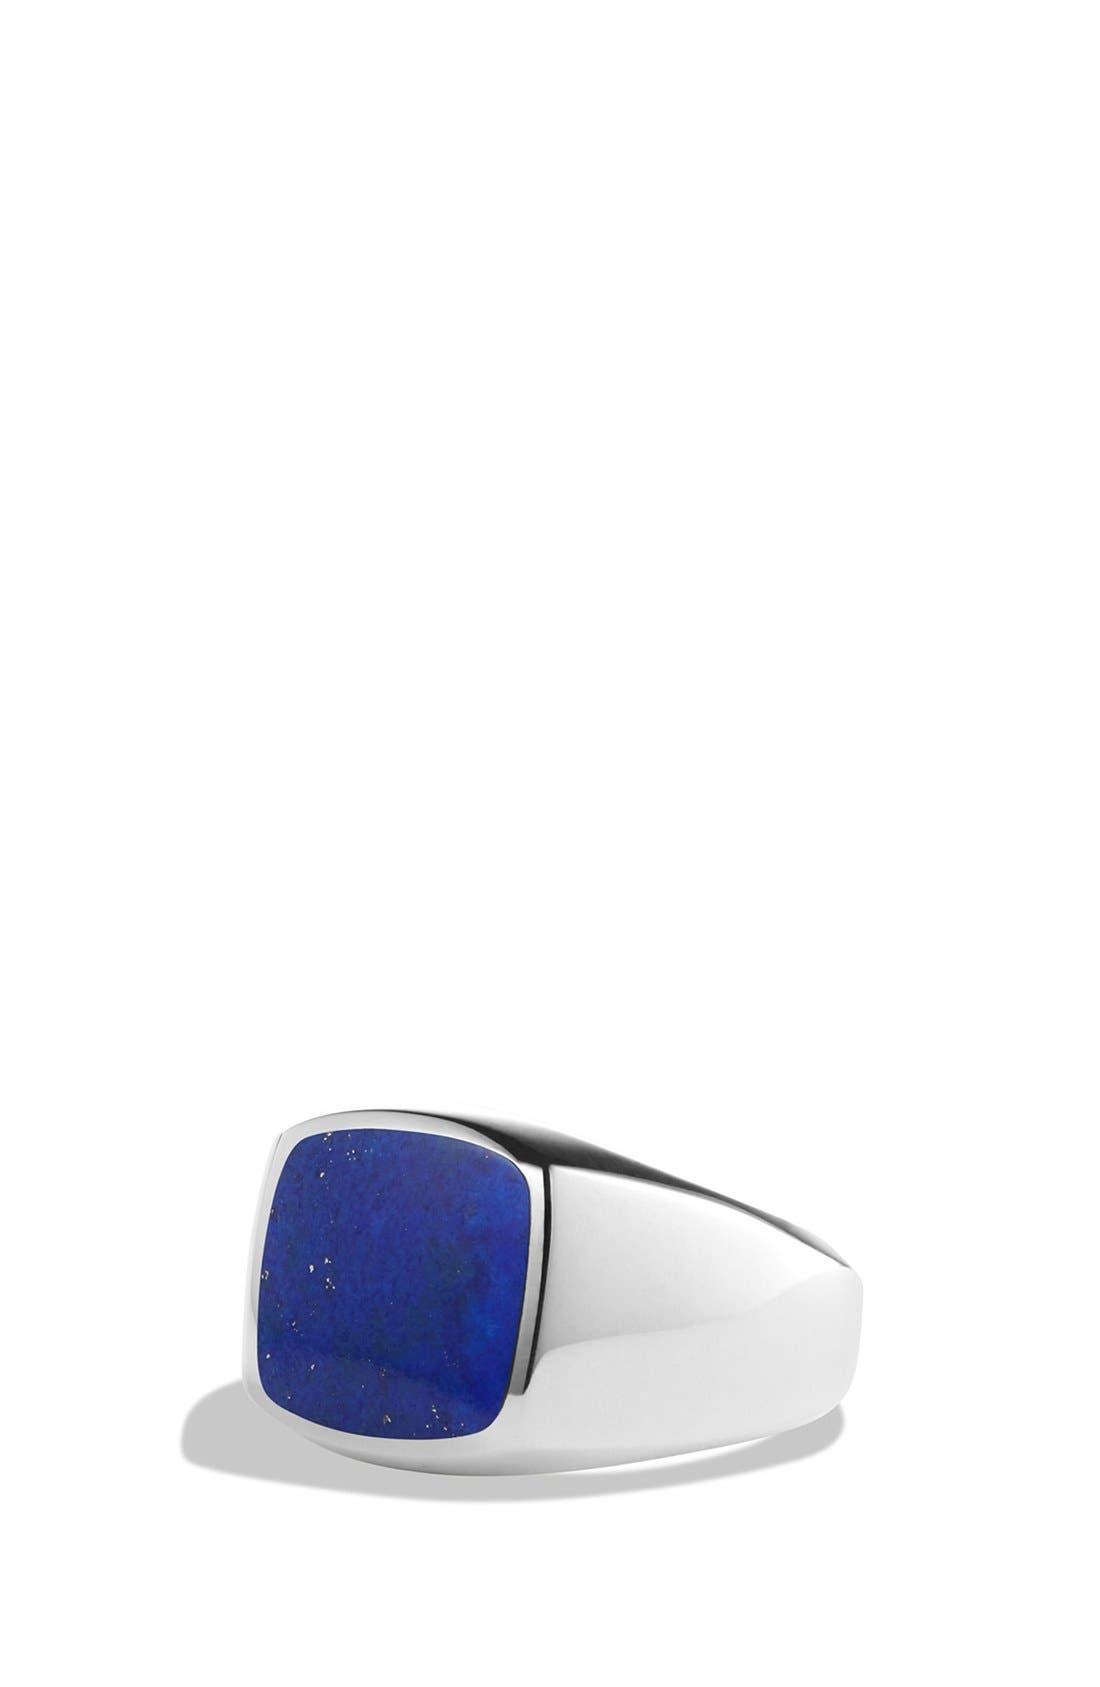 Alternate Image 1 Selected - David Yurman 'Exotic Stone' Signet Ring in Silver